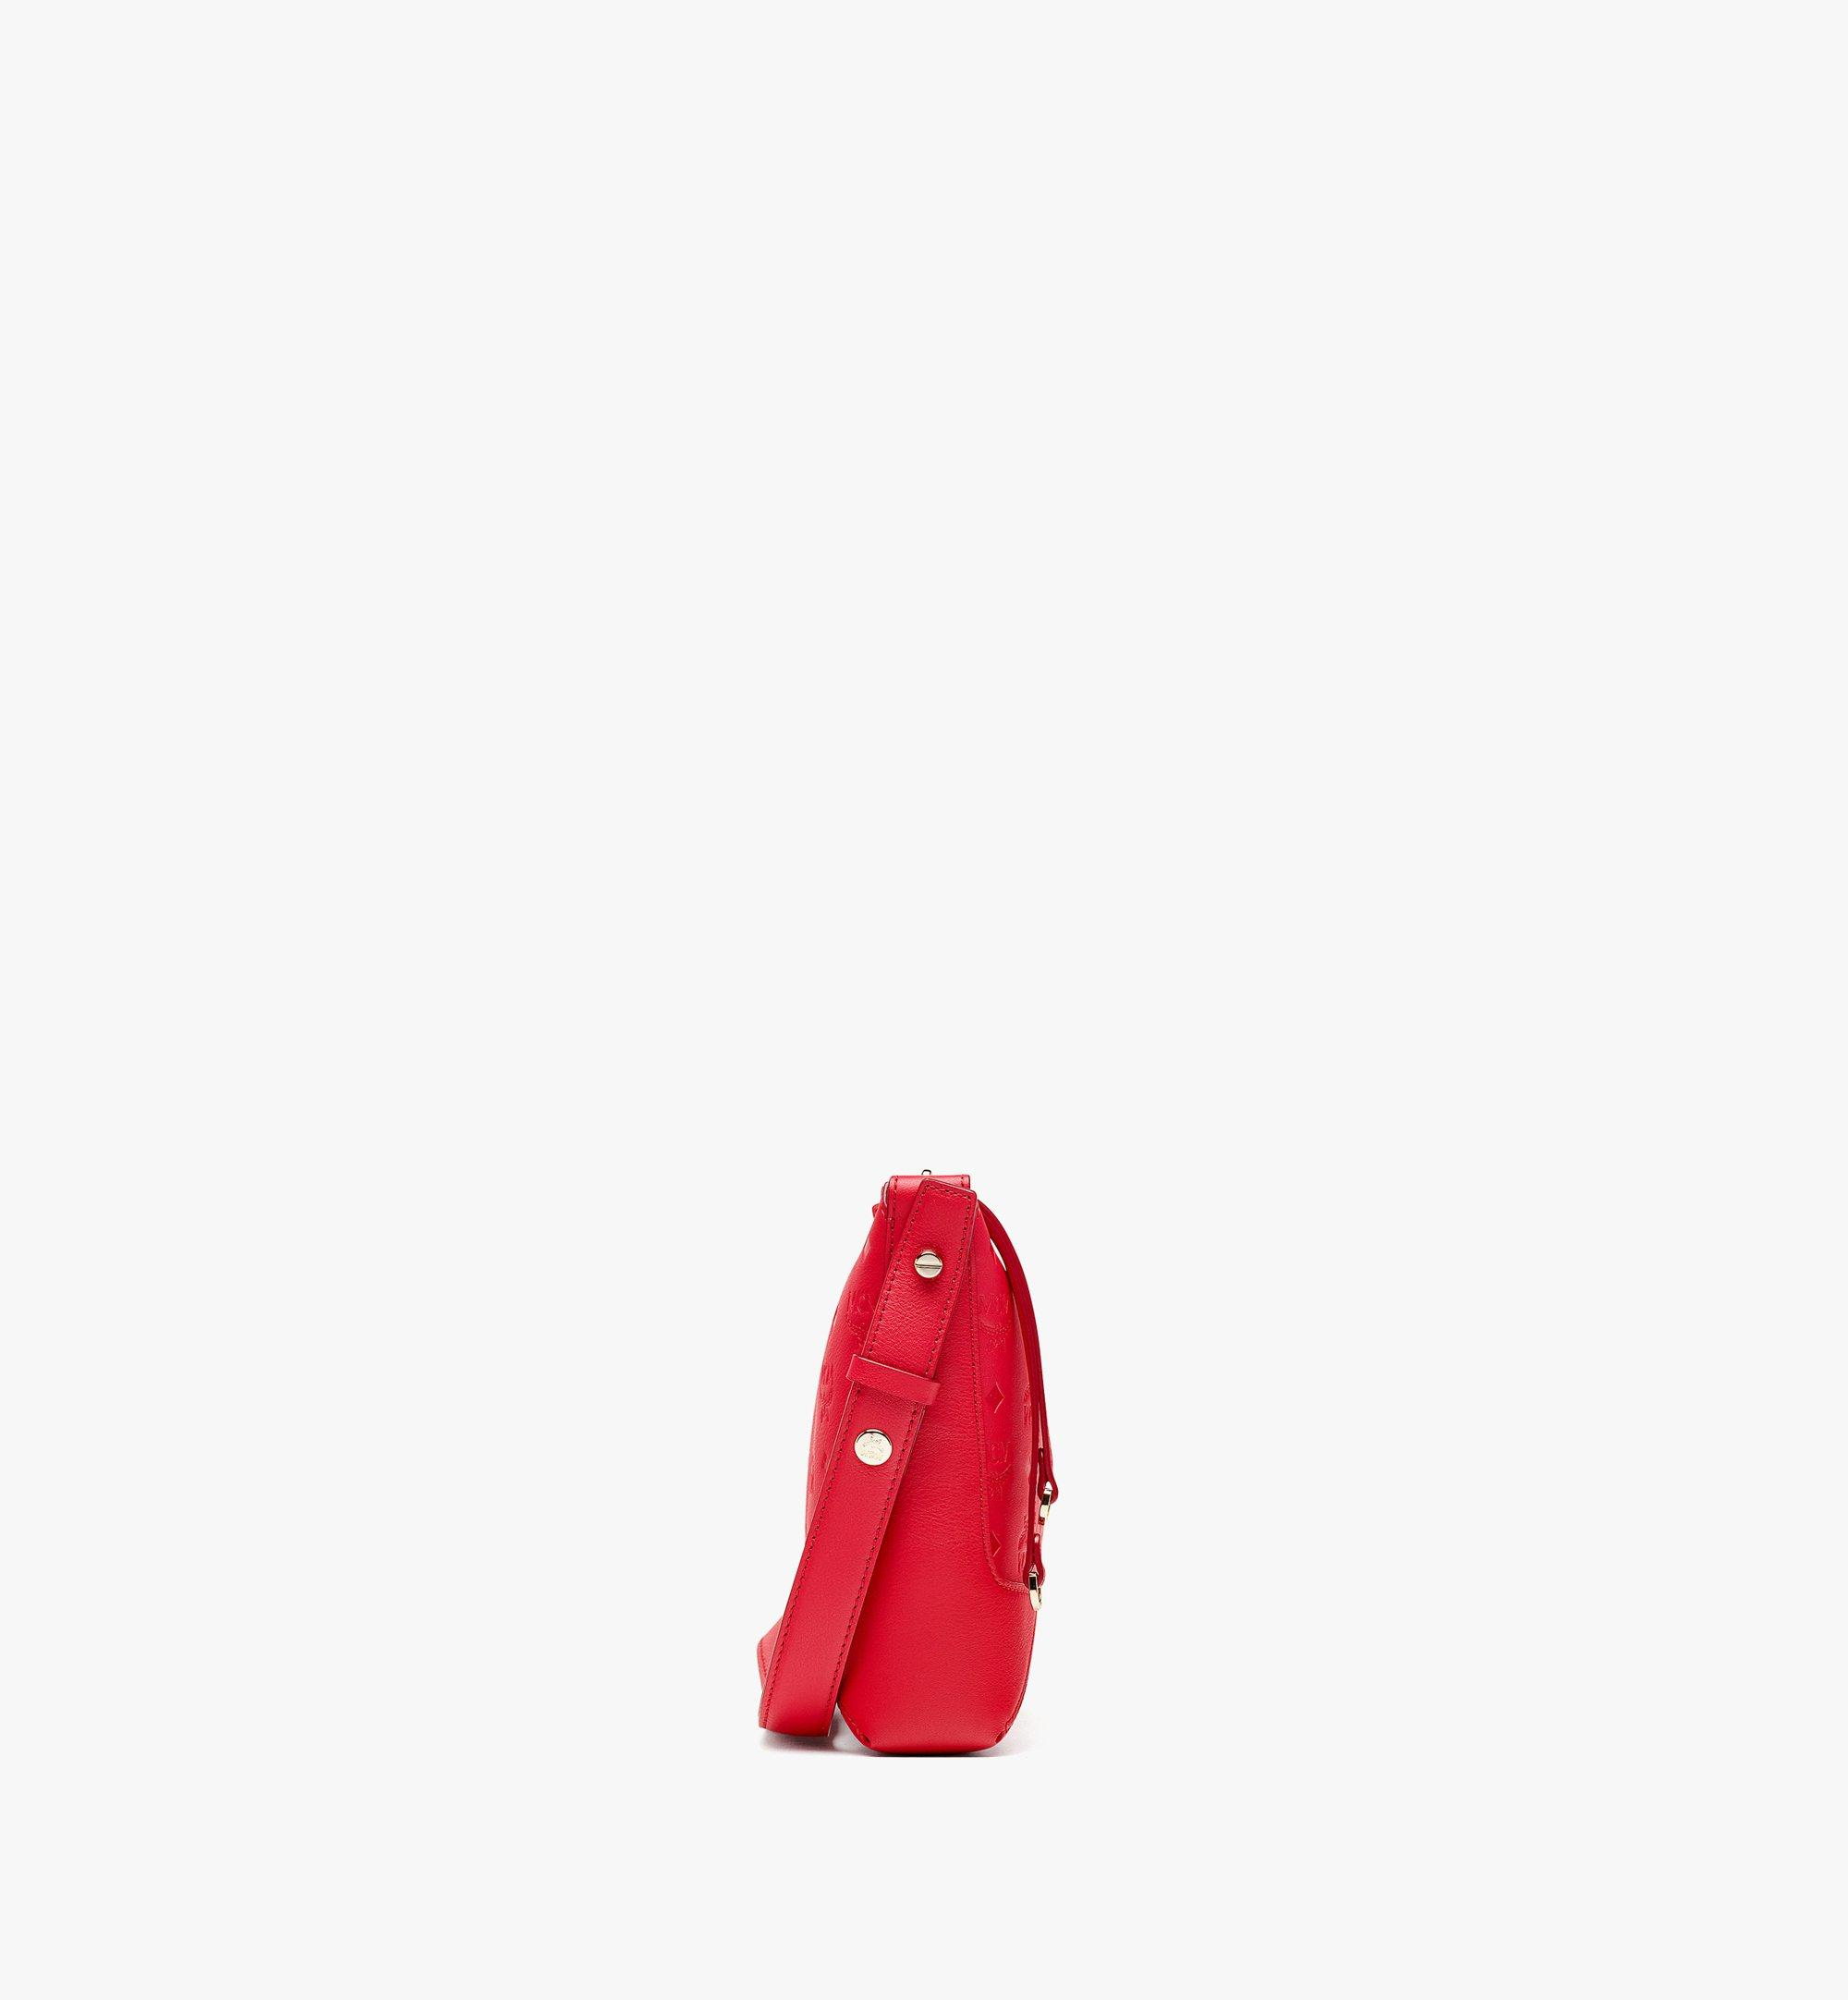 MCM Klara Shoulder Bag in Monogram Leather Red MWSBSKM02R0001 Alternate View 1